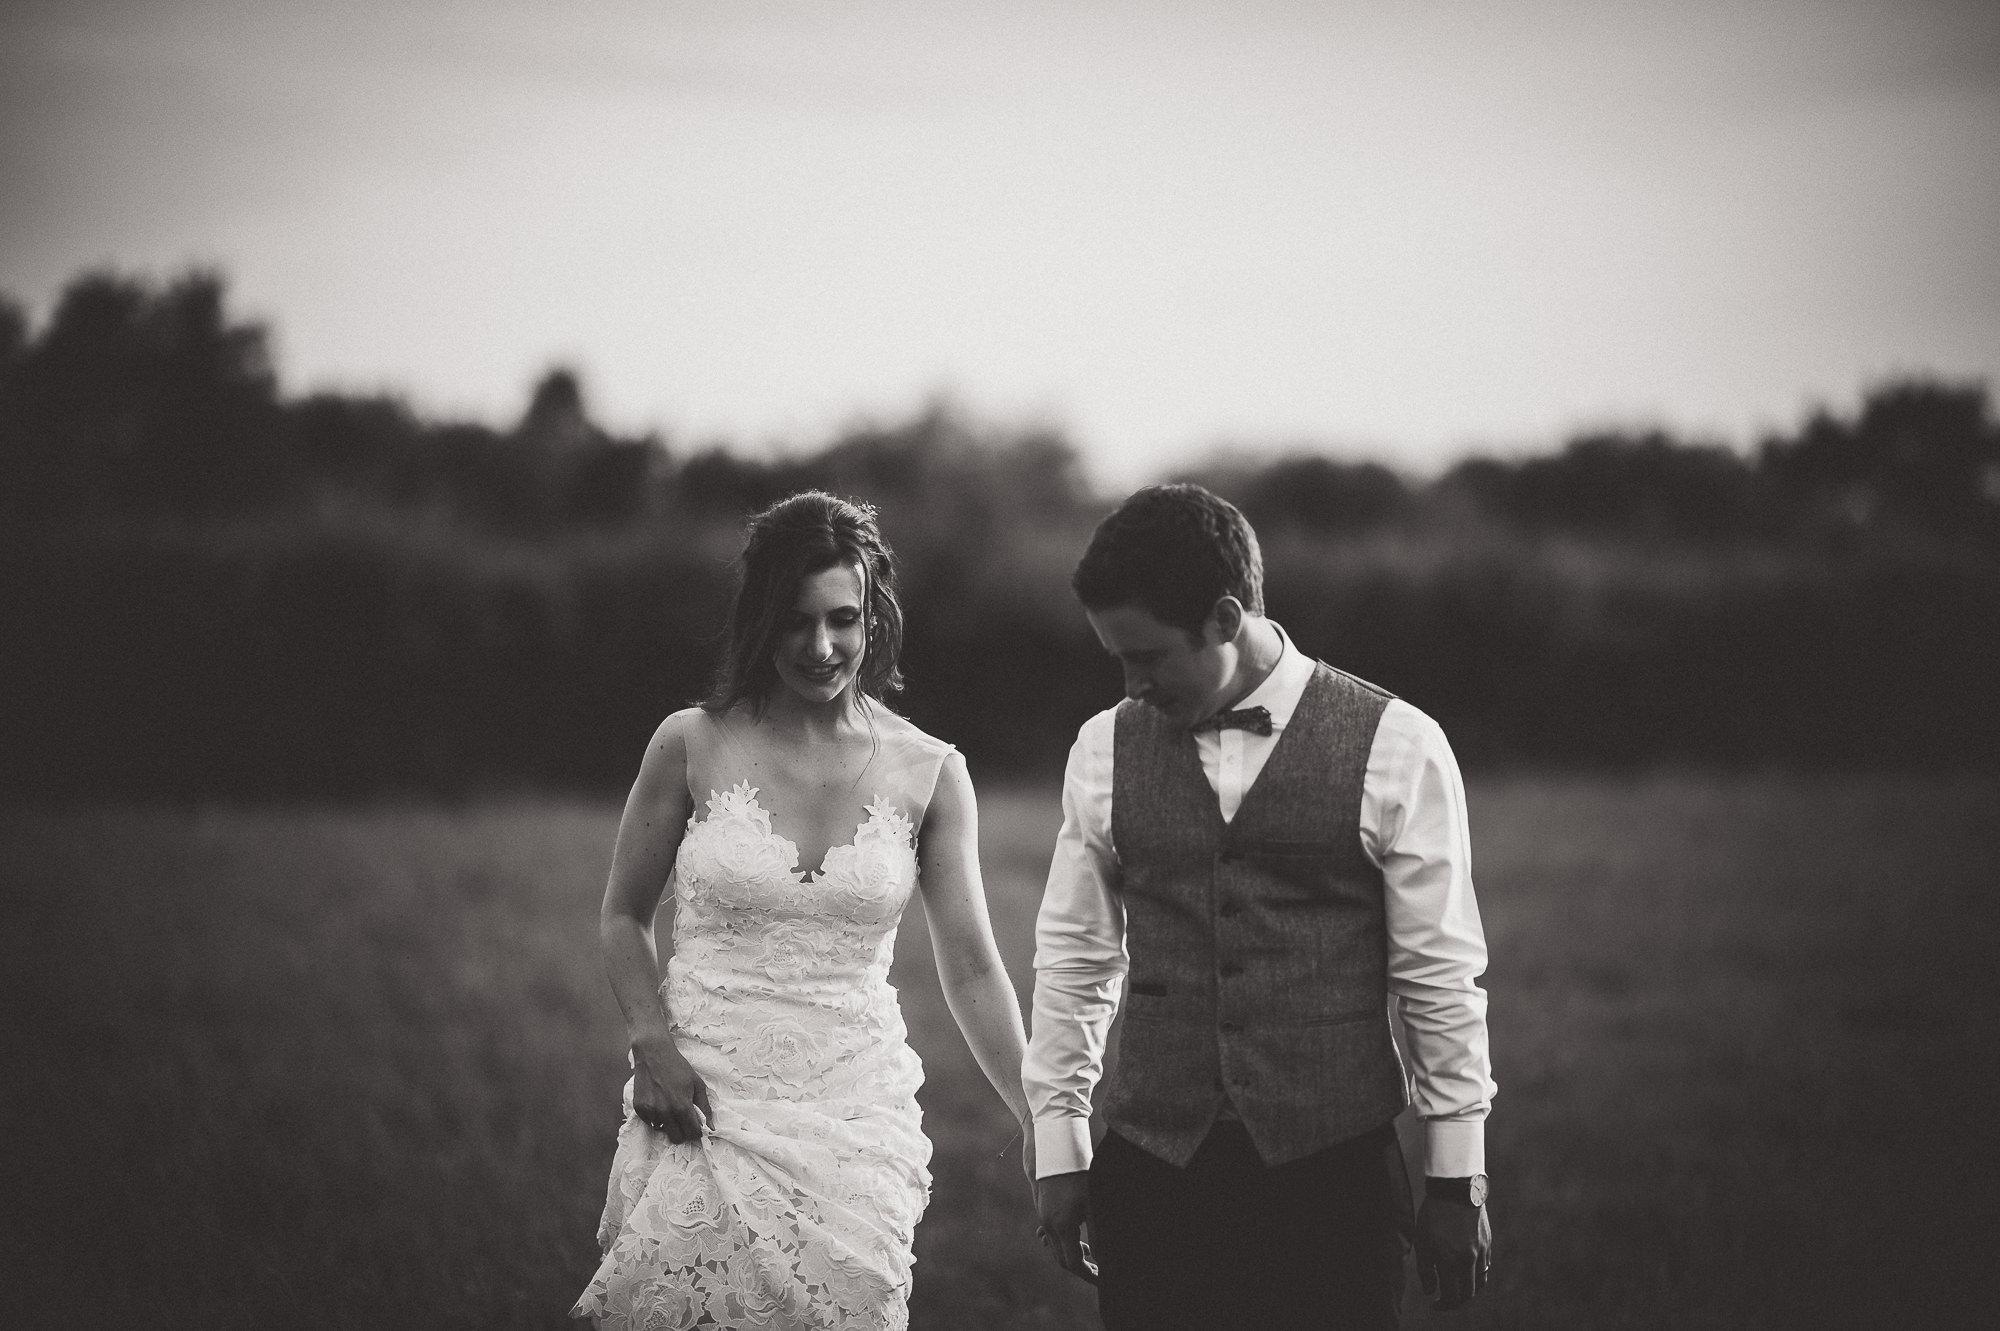 Veils & Bales Wedding Photography | Charlie & Steve SCSS 236